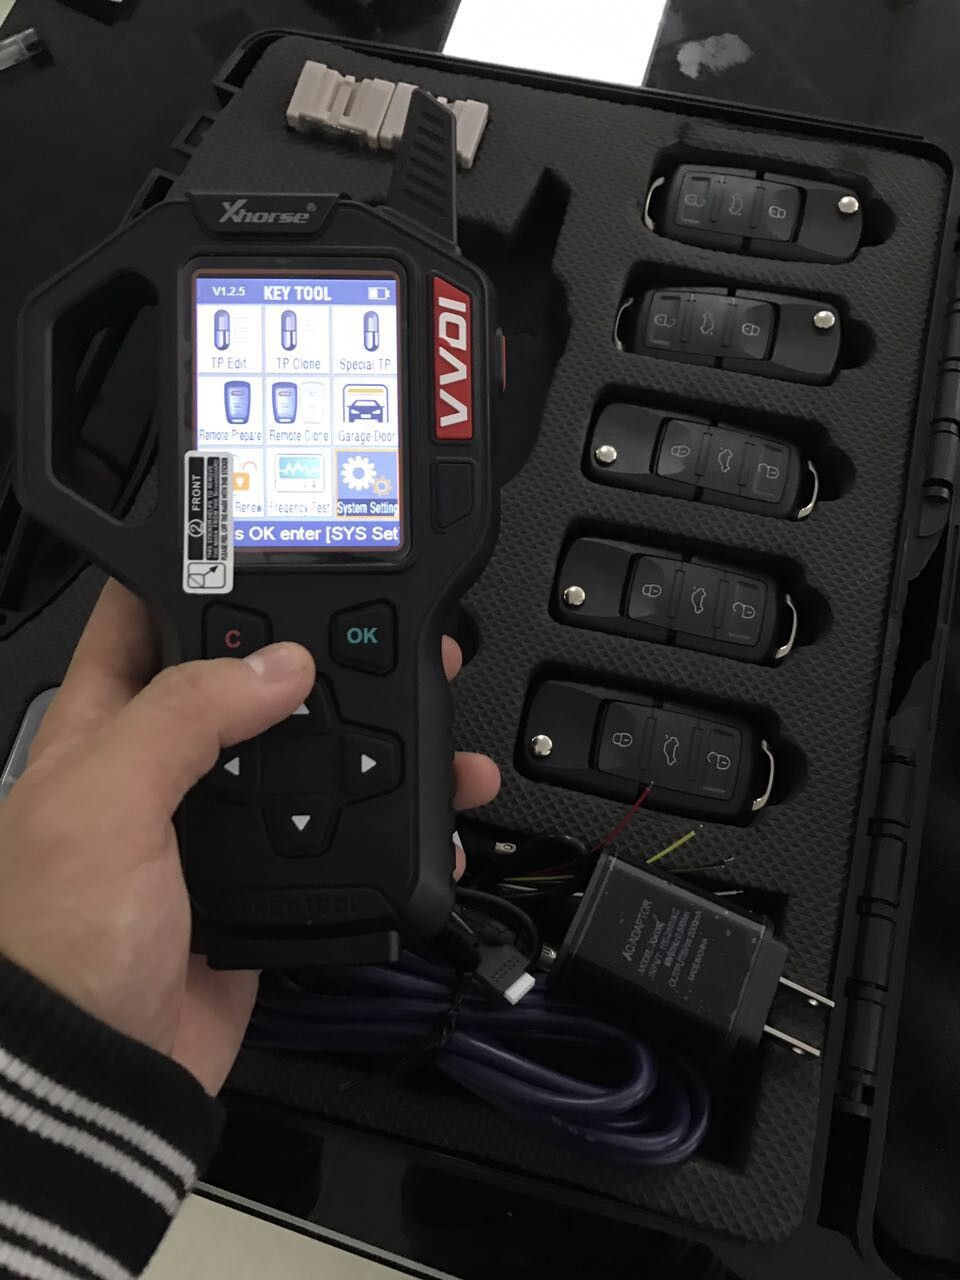 2017 New Arrival Original Xhorse Vvdi Key Tool Remote Key